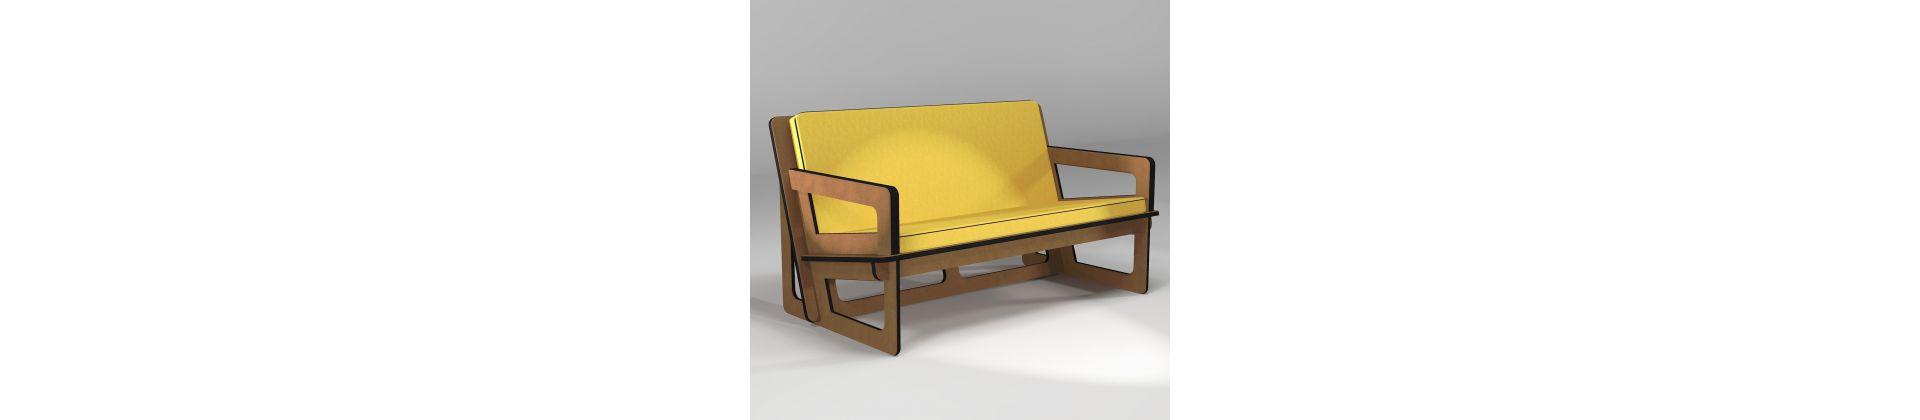 Tailor-made Sofa